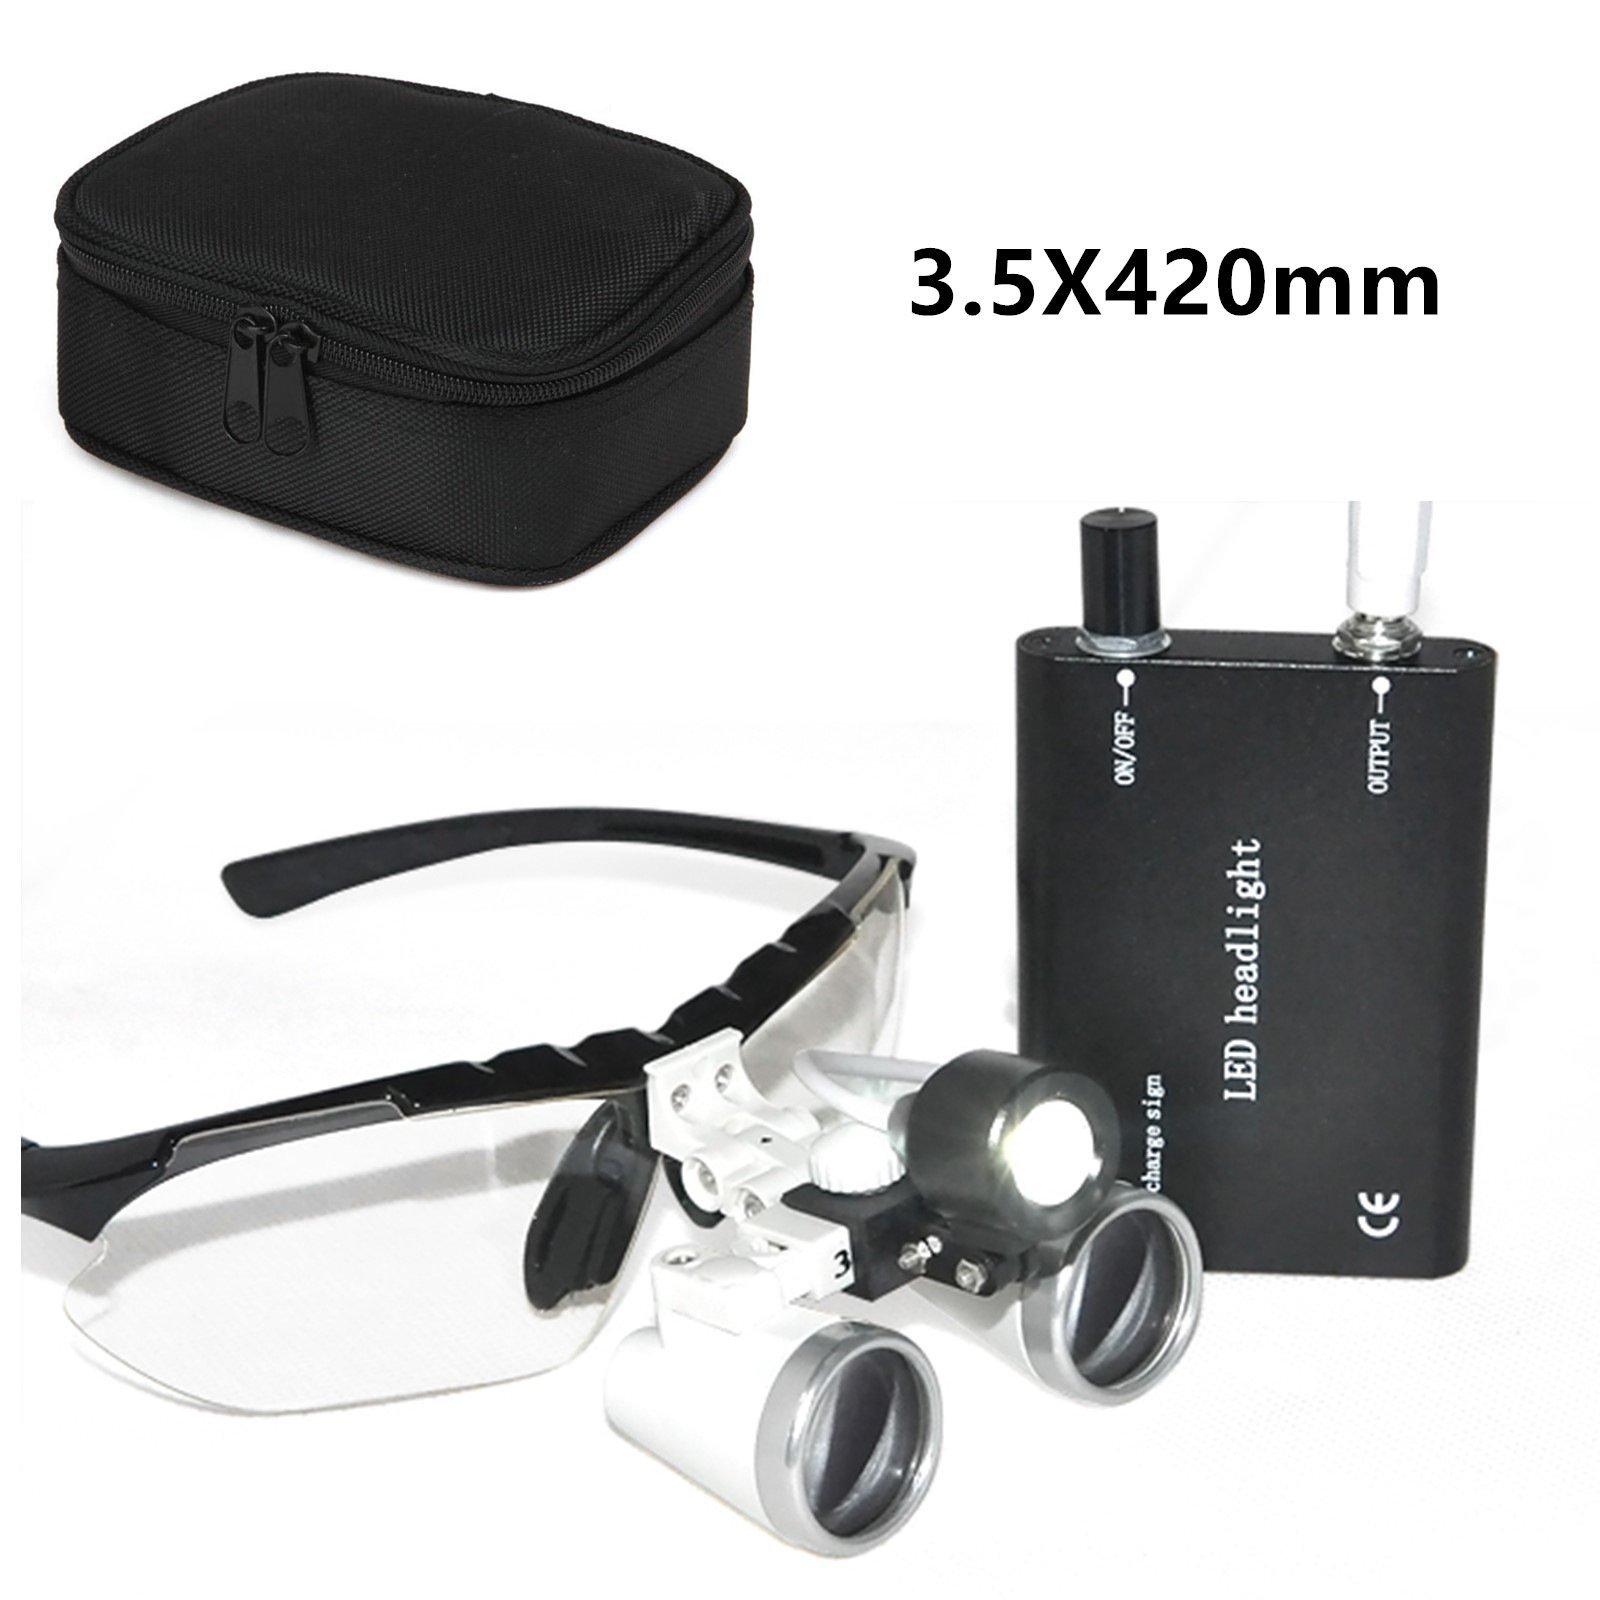 Denshine® Dental Surgical Medical Binocular Loupes Optical Glass Loupe 3.5x 420mm + Dental Head Light Lamp +Carry bag (Black)